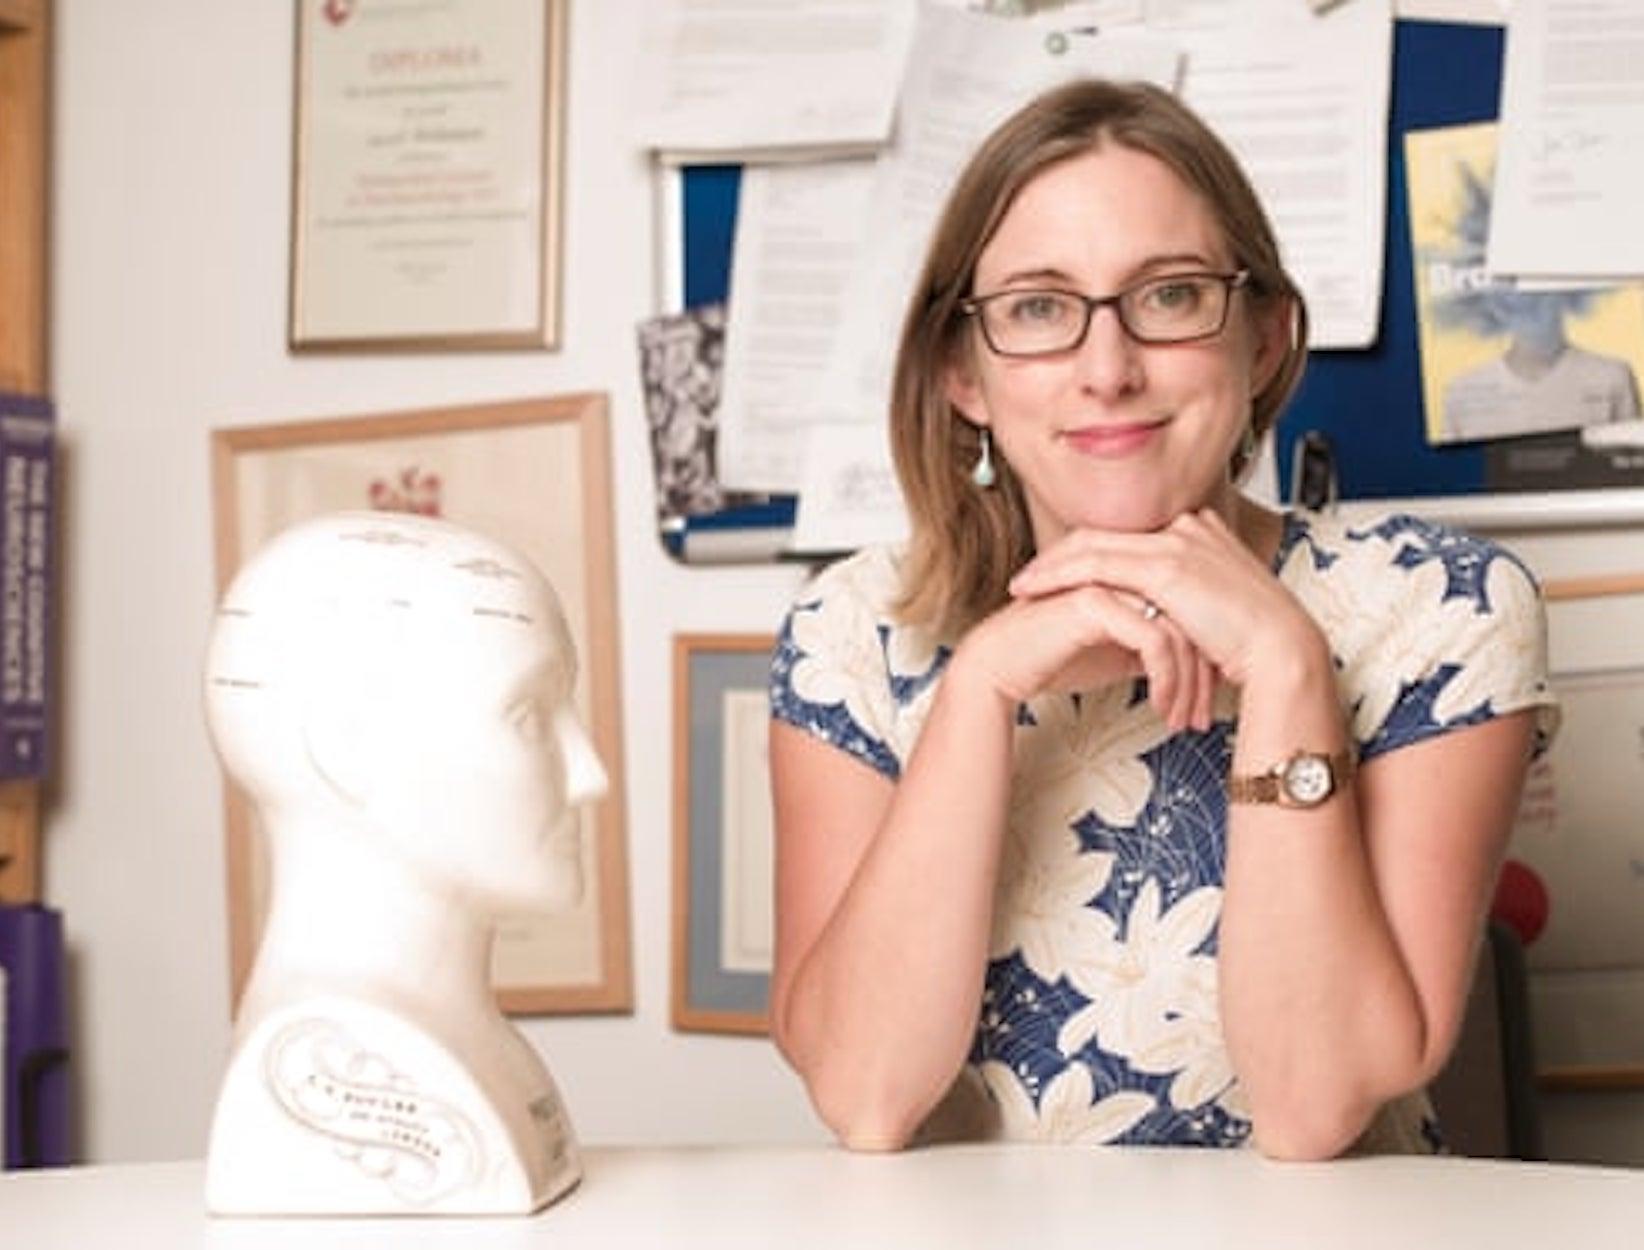 Myth-Busting Study of Teenage Brains Wins Royal Society Prize